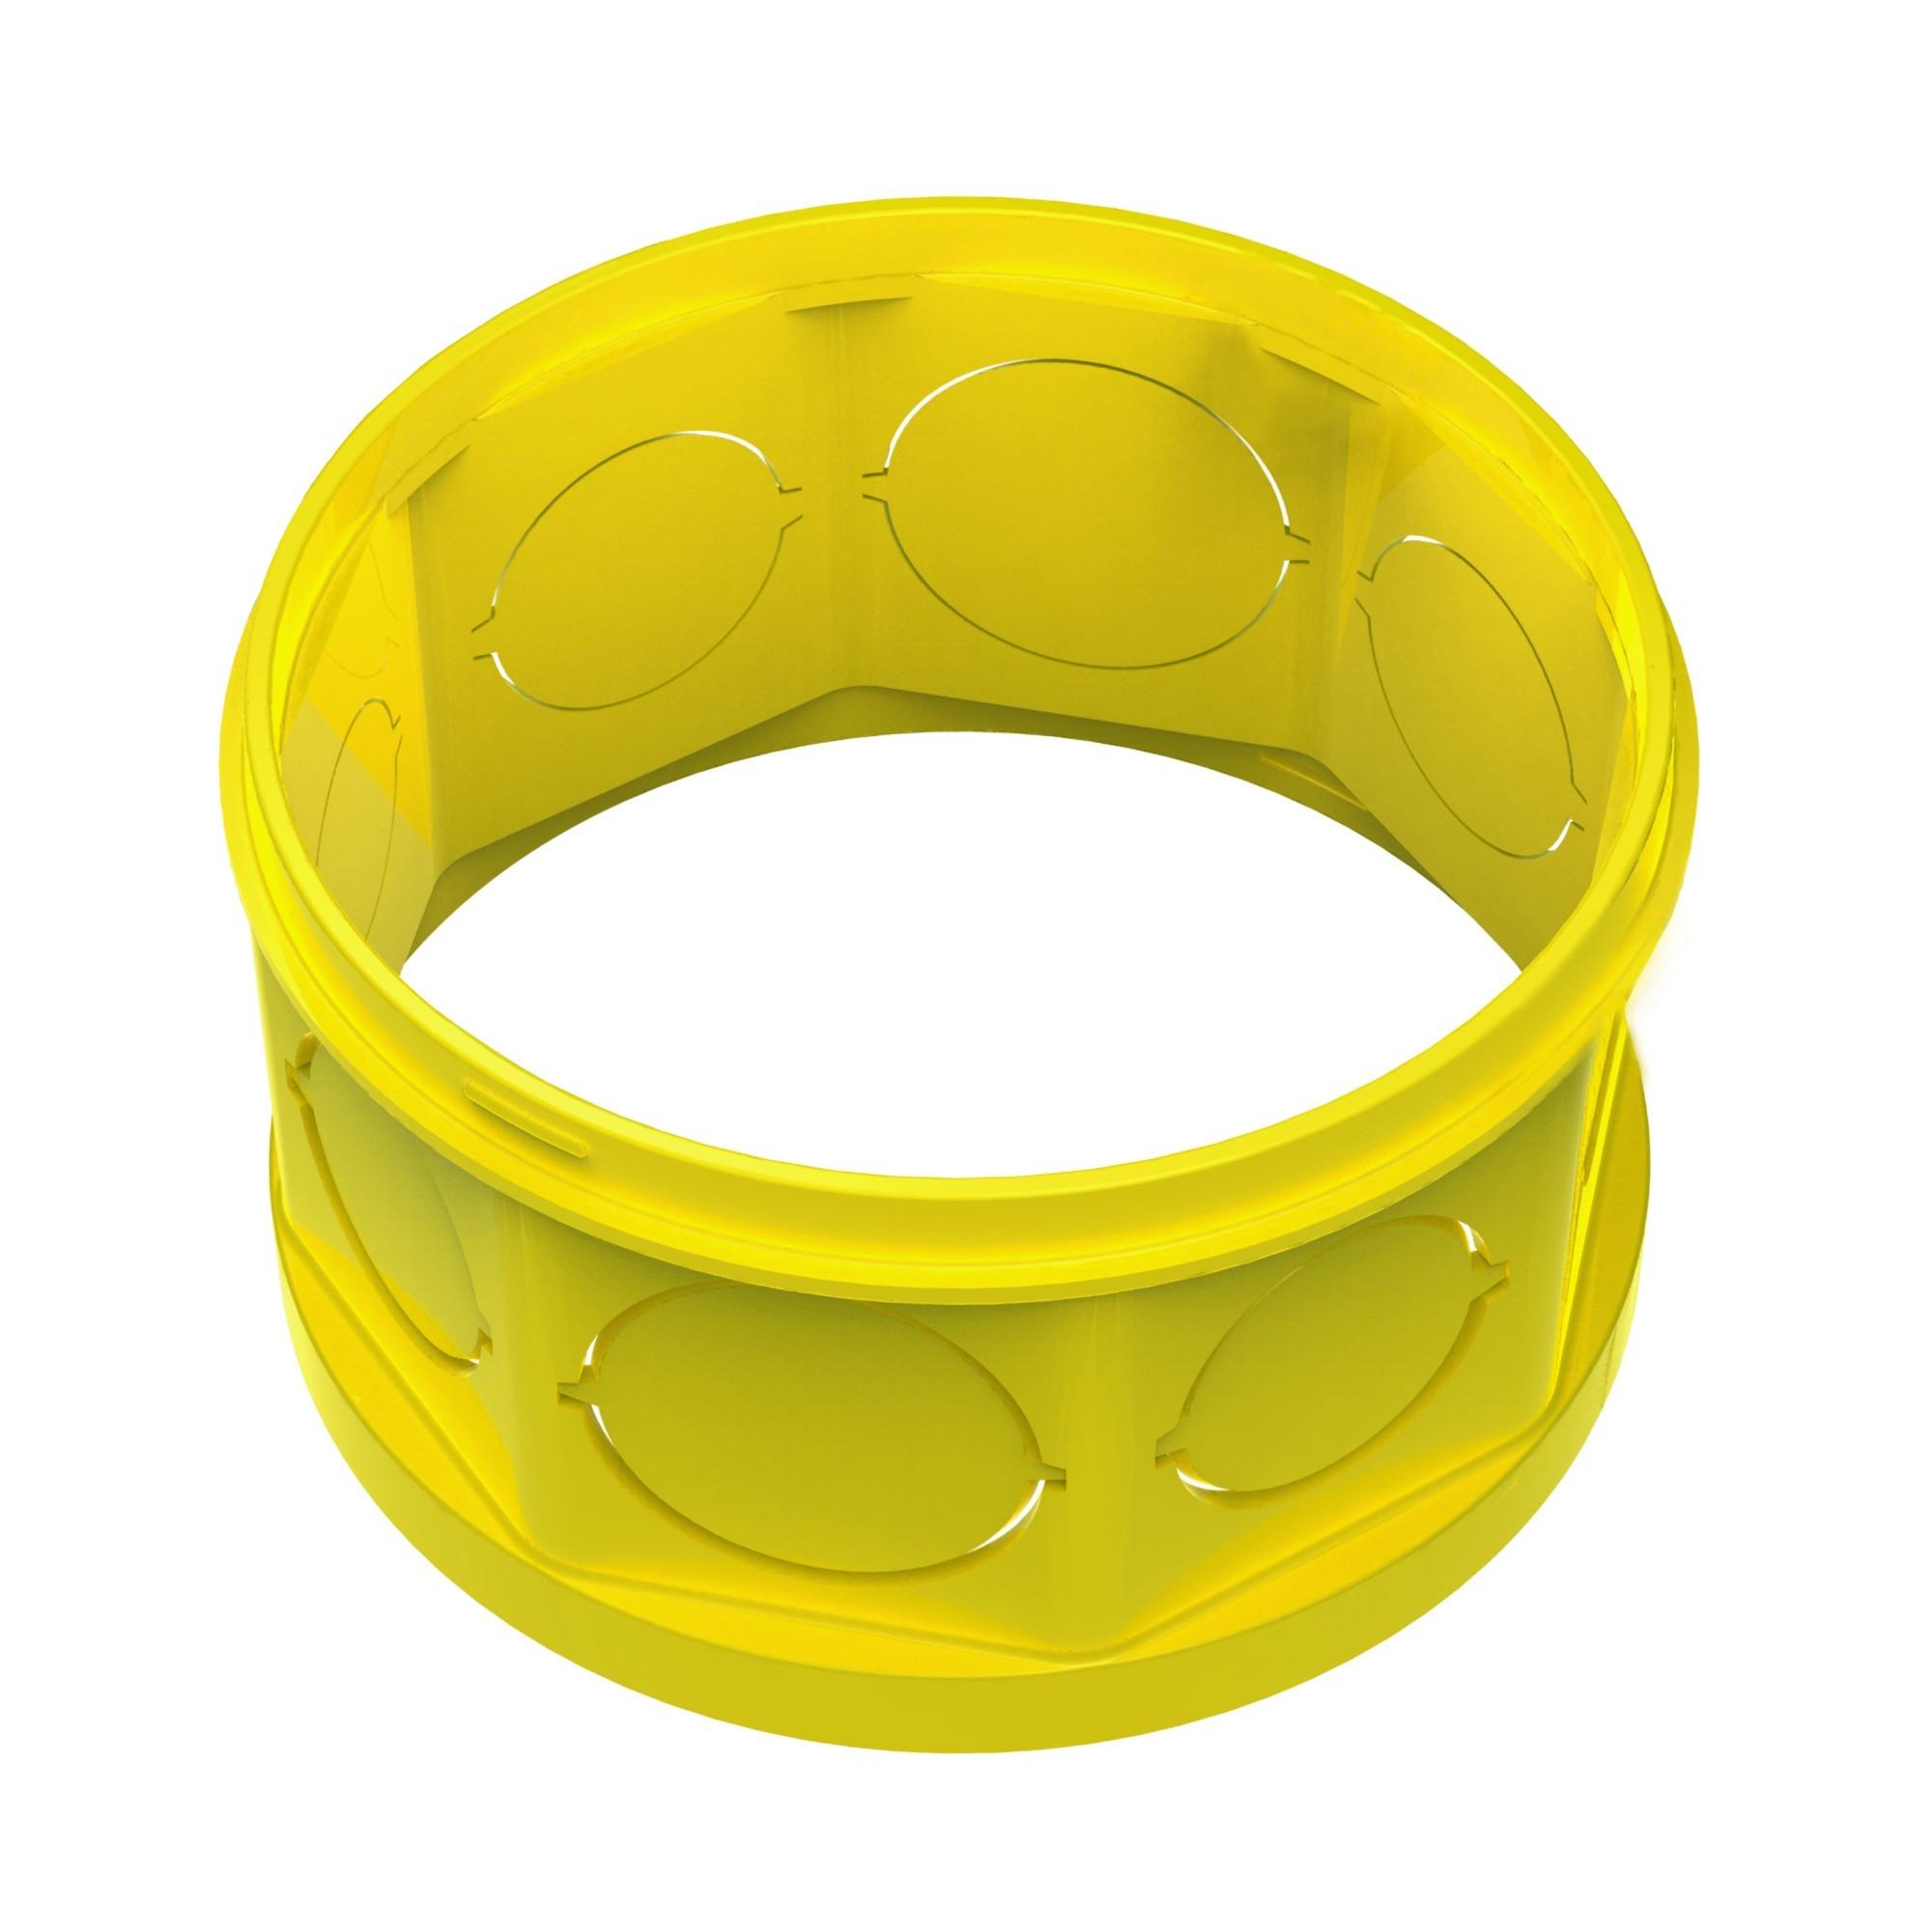 Prolongador 4X4 Amarela Octogonal Flex - Amanco